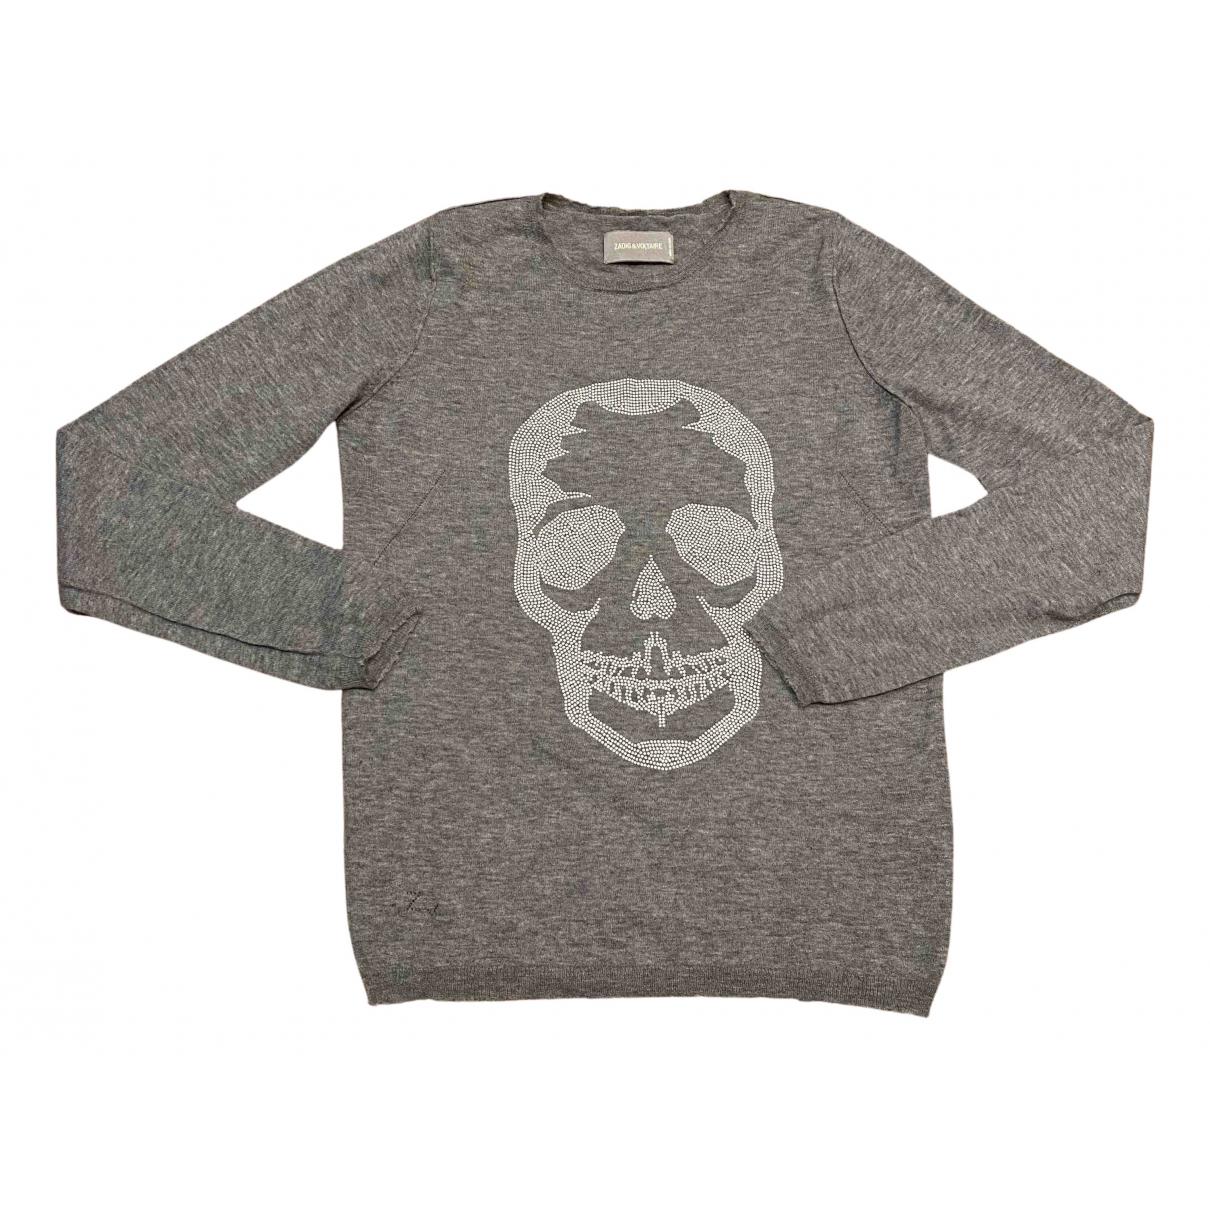 Zadig & Voltaire N Grey Cashmere Knitwear for Women S International